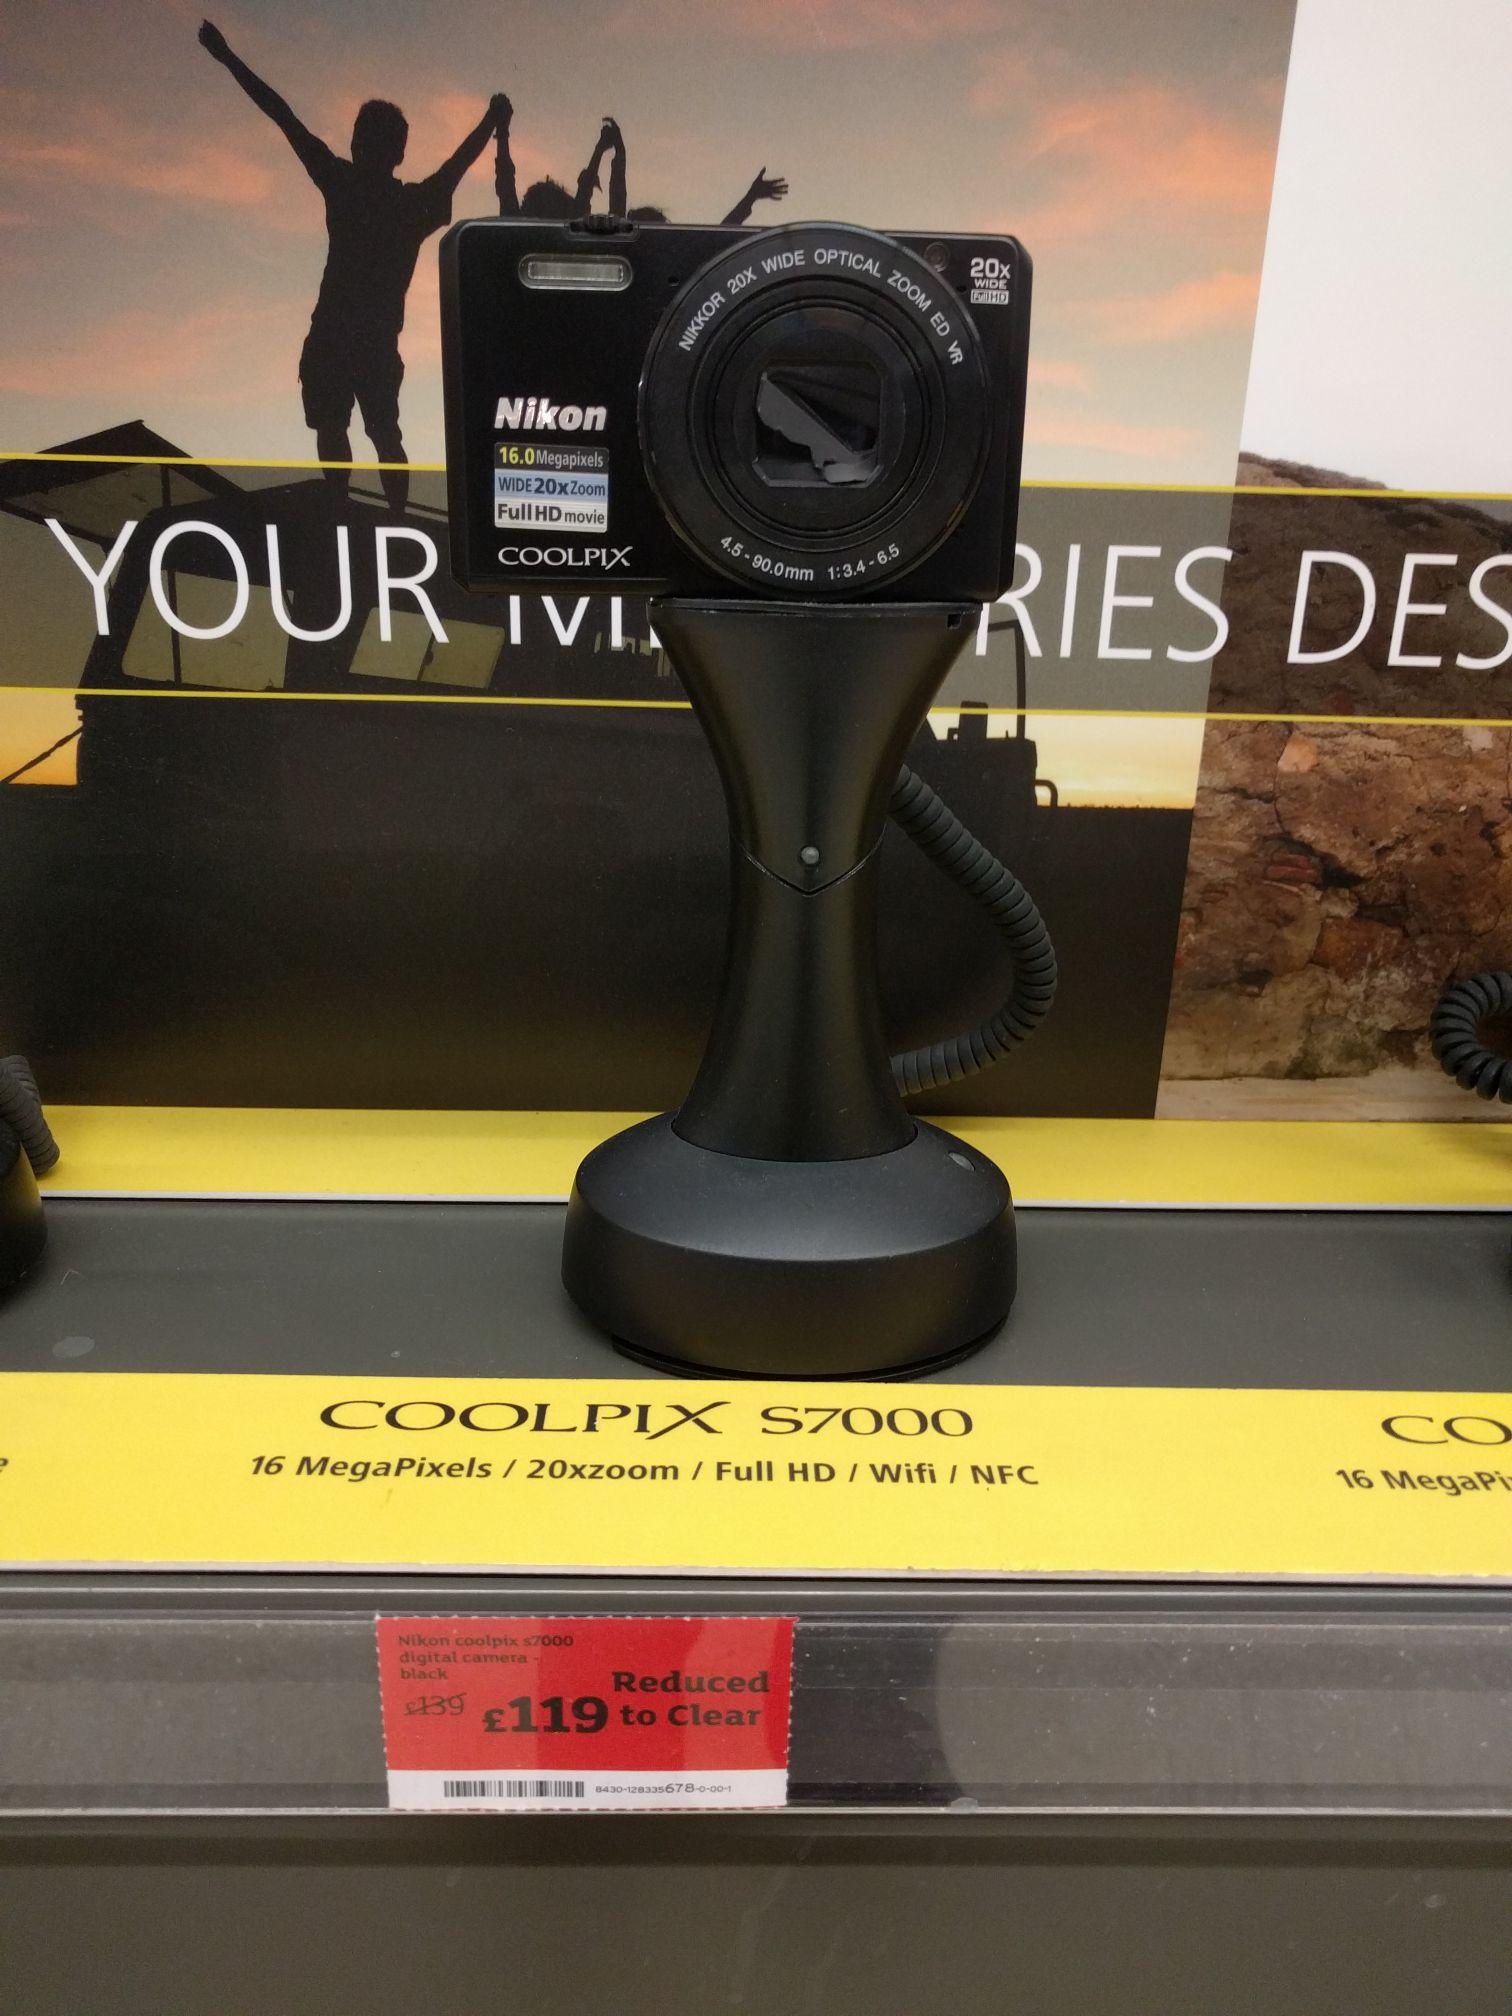 Nikon Coolpix S7000 - £119 instore @ Sainsbury's Whitechapel